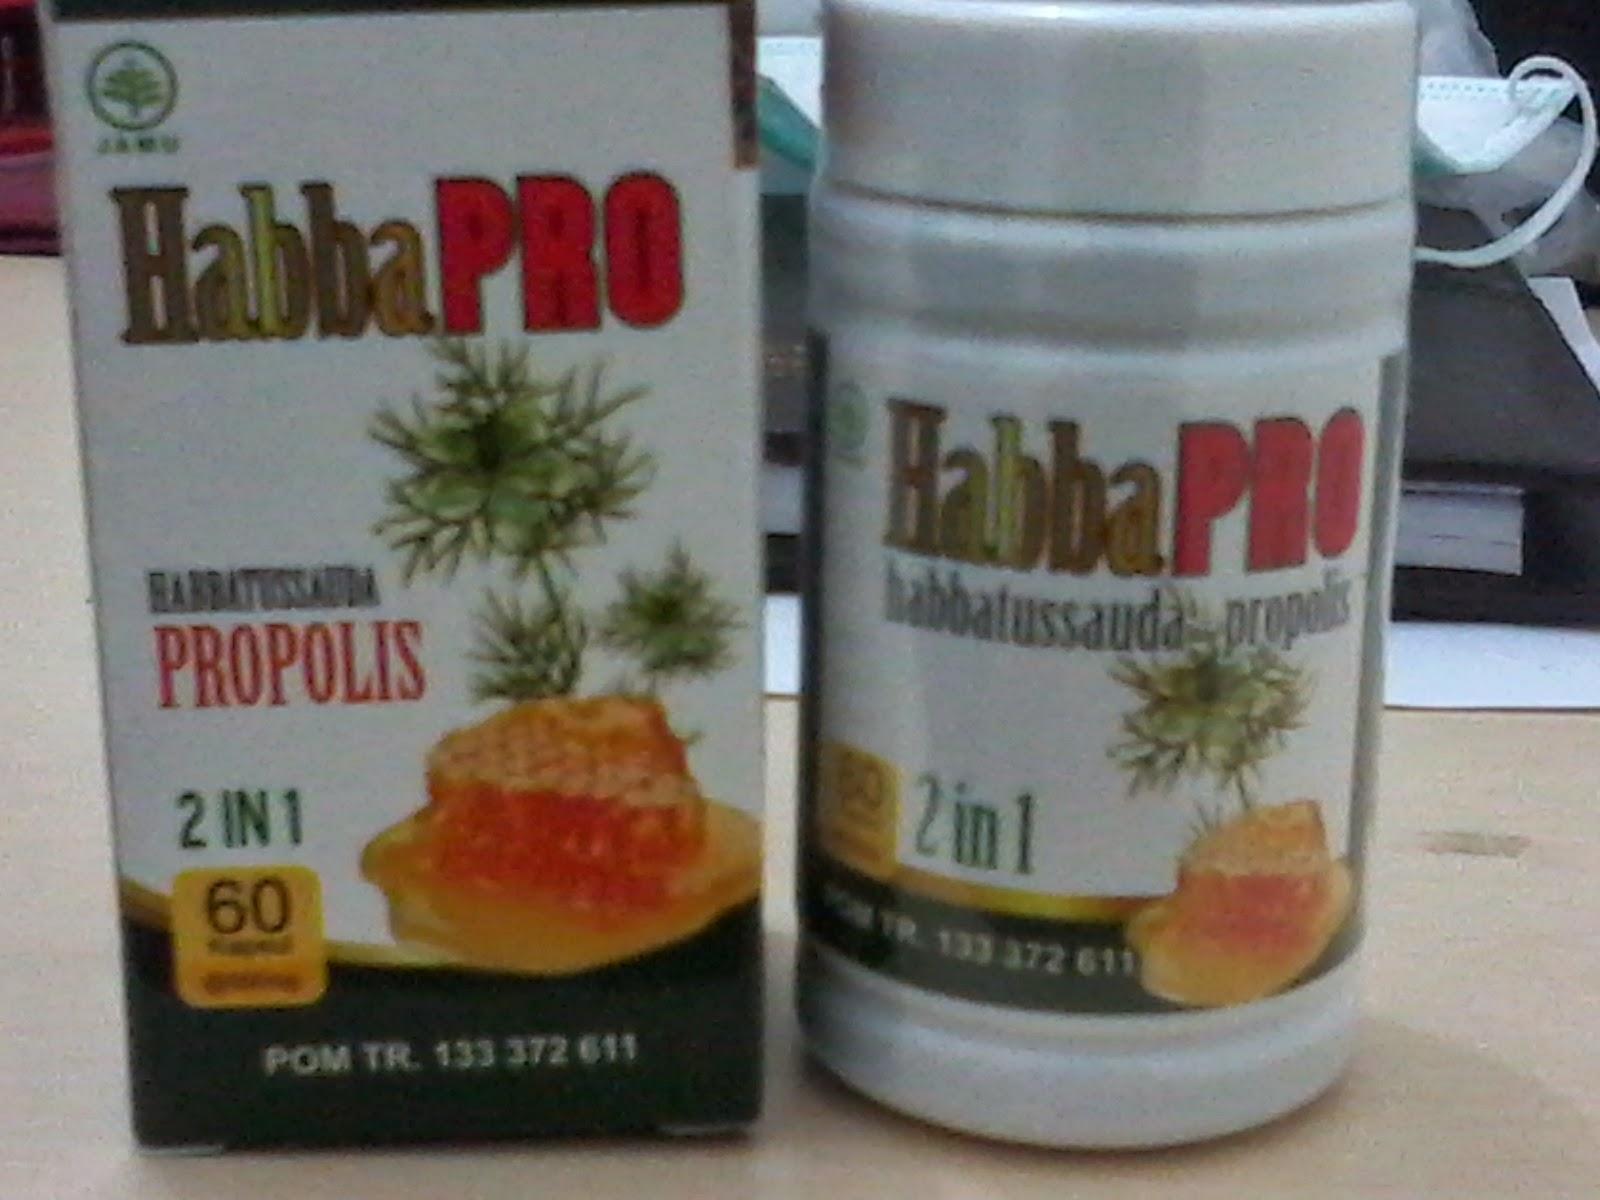 Habbapro Kapsul Habbatussauda Dan Propolis Umara Store Msi Merupakan Perpaduan Antara Yang Digabungkan Menjadi Satu Dikemas Dalam Bentuk Herbal Ini Sudah